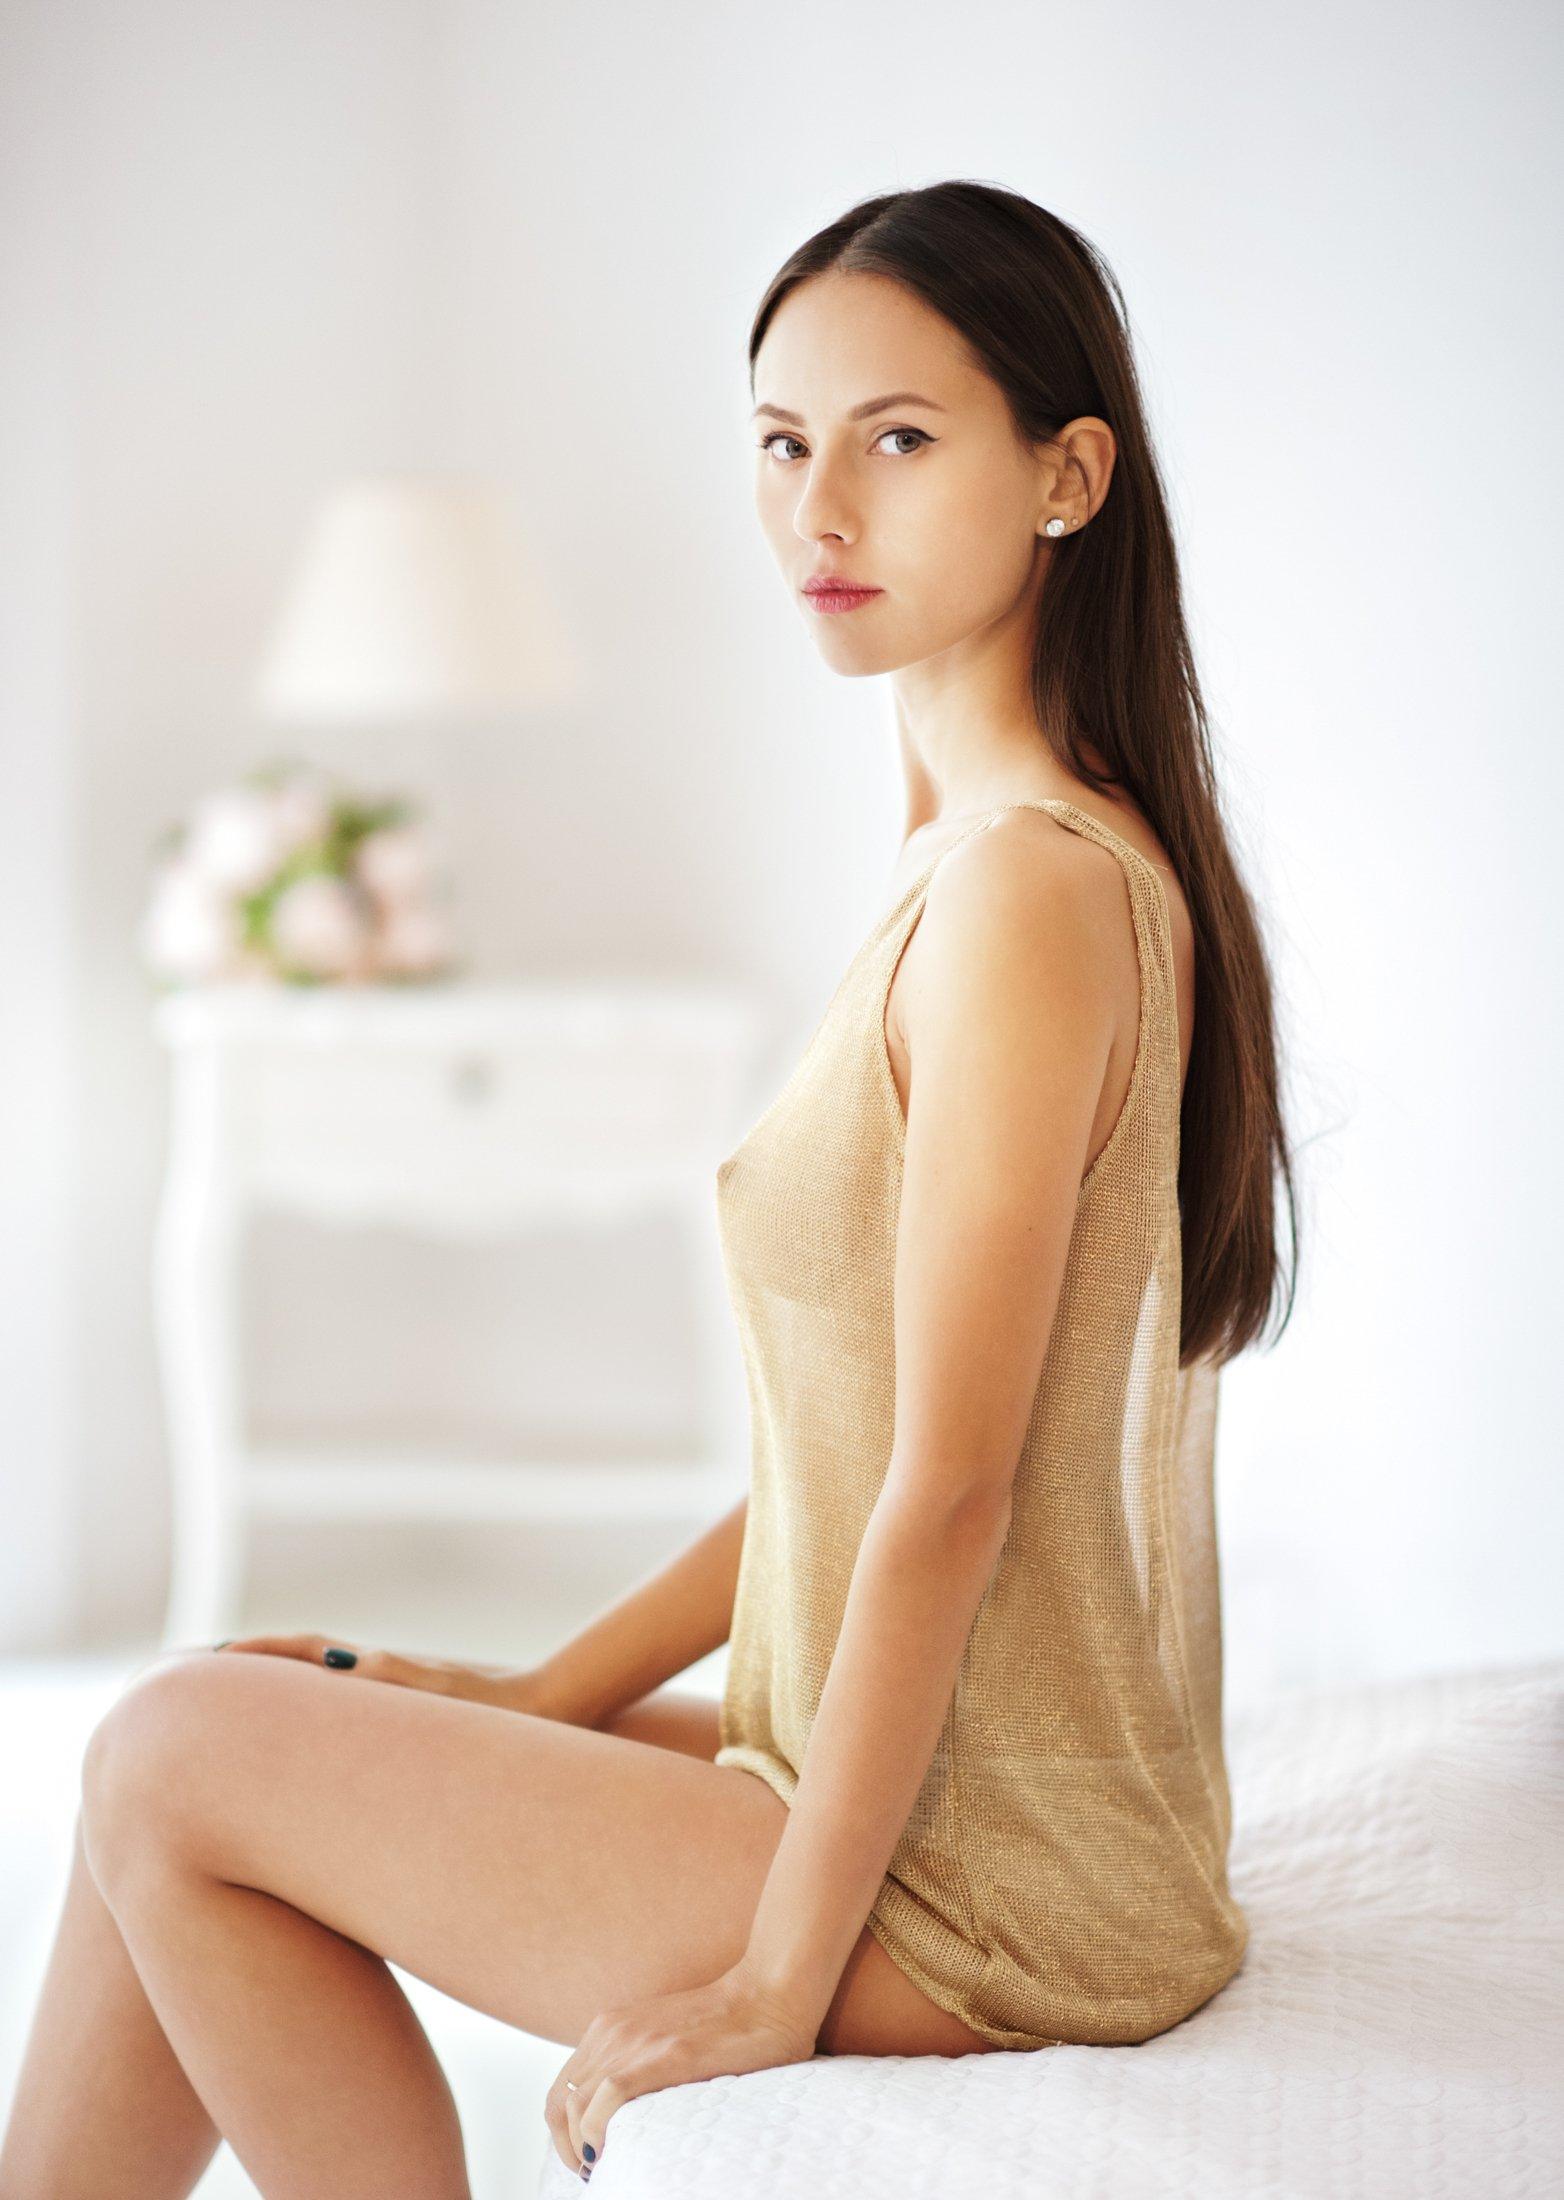 2019, beautiful, girl, model, portrait, portrait2019, sexy, studio, девушка, портрет, Максим Максимов